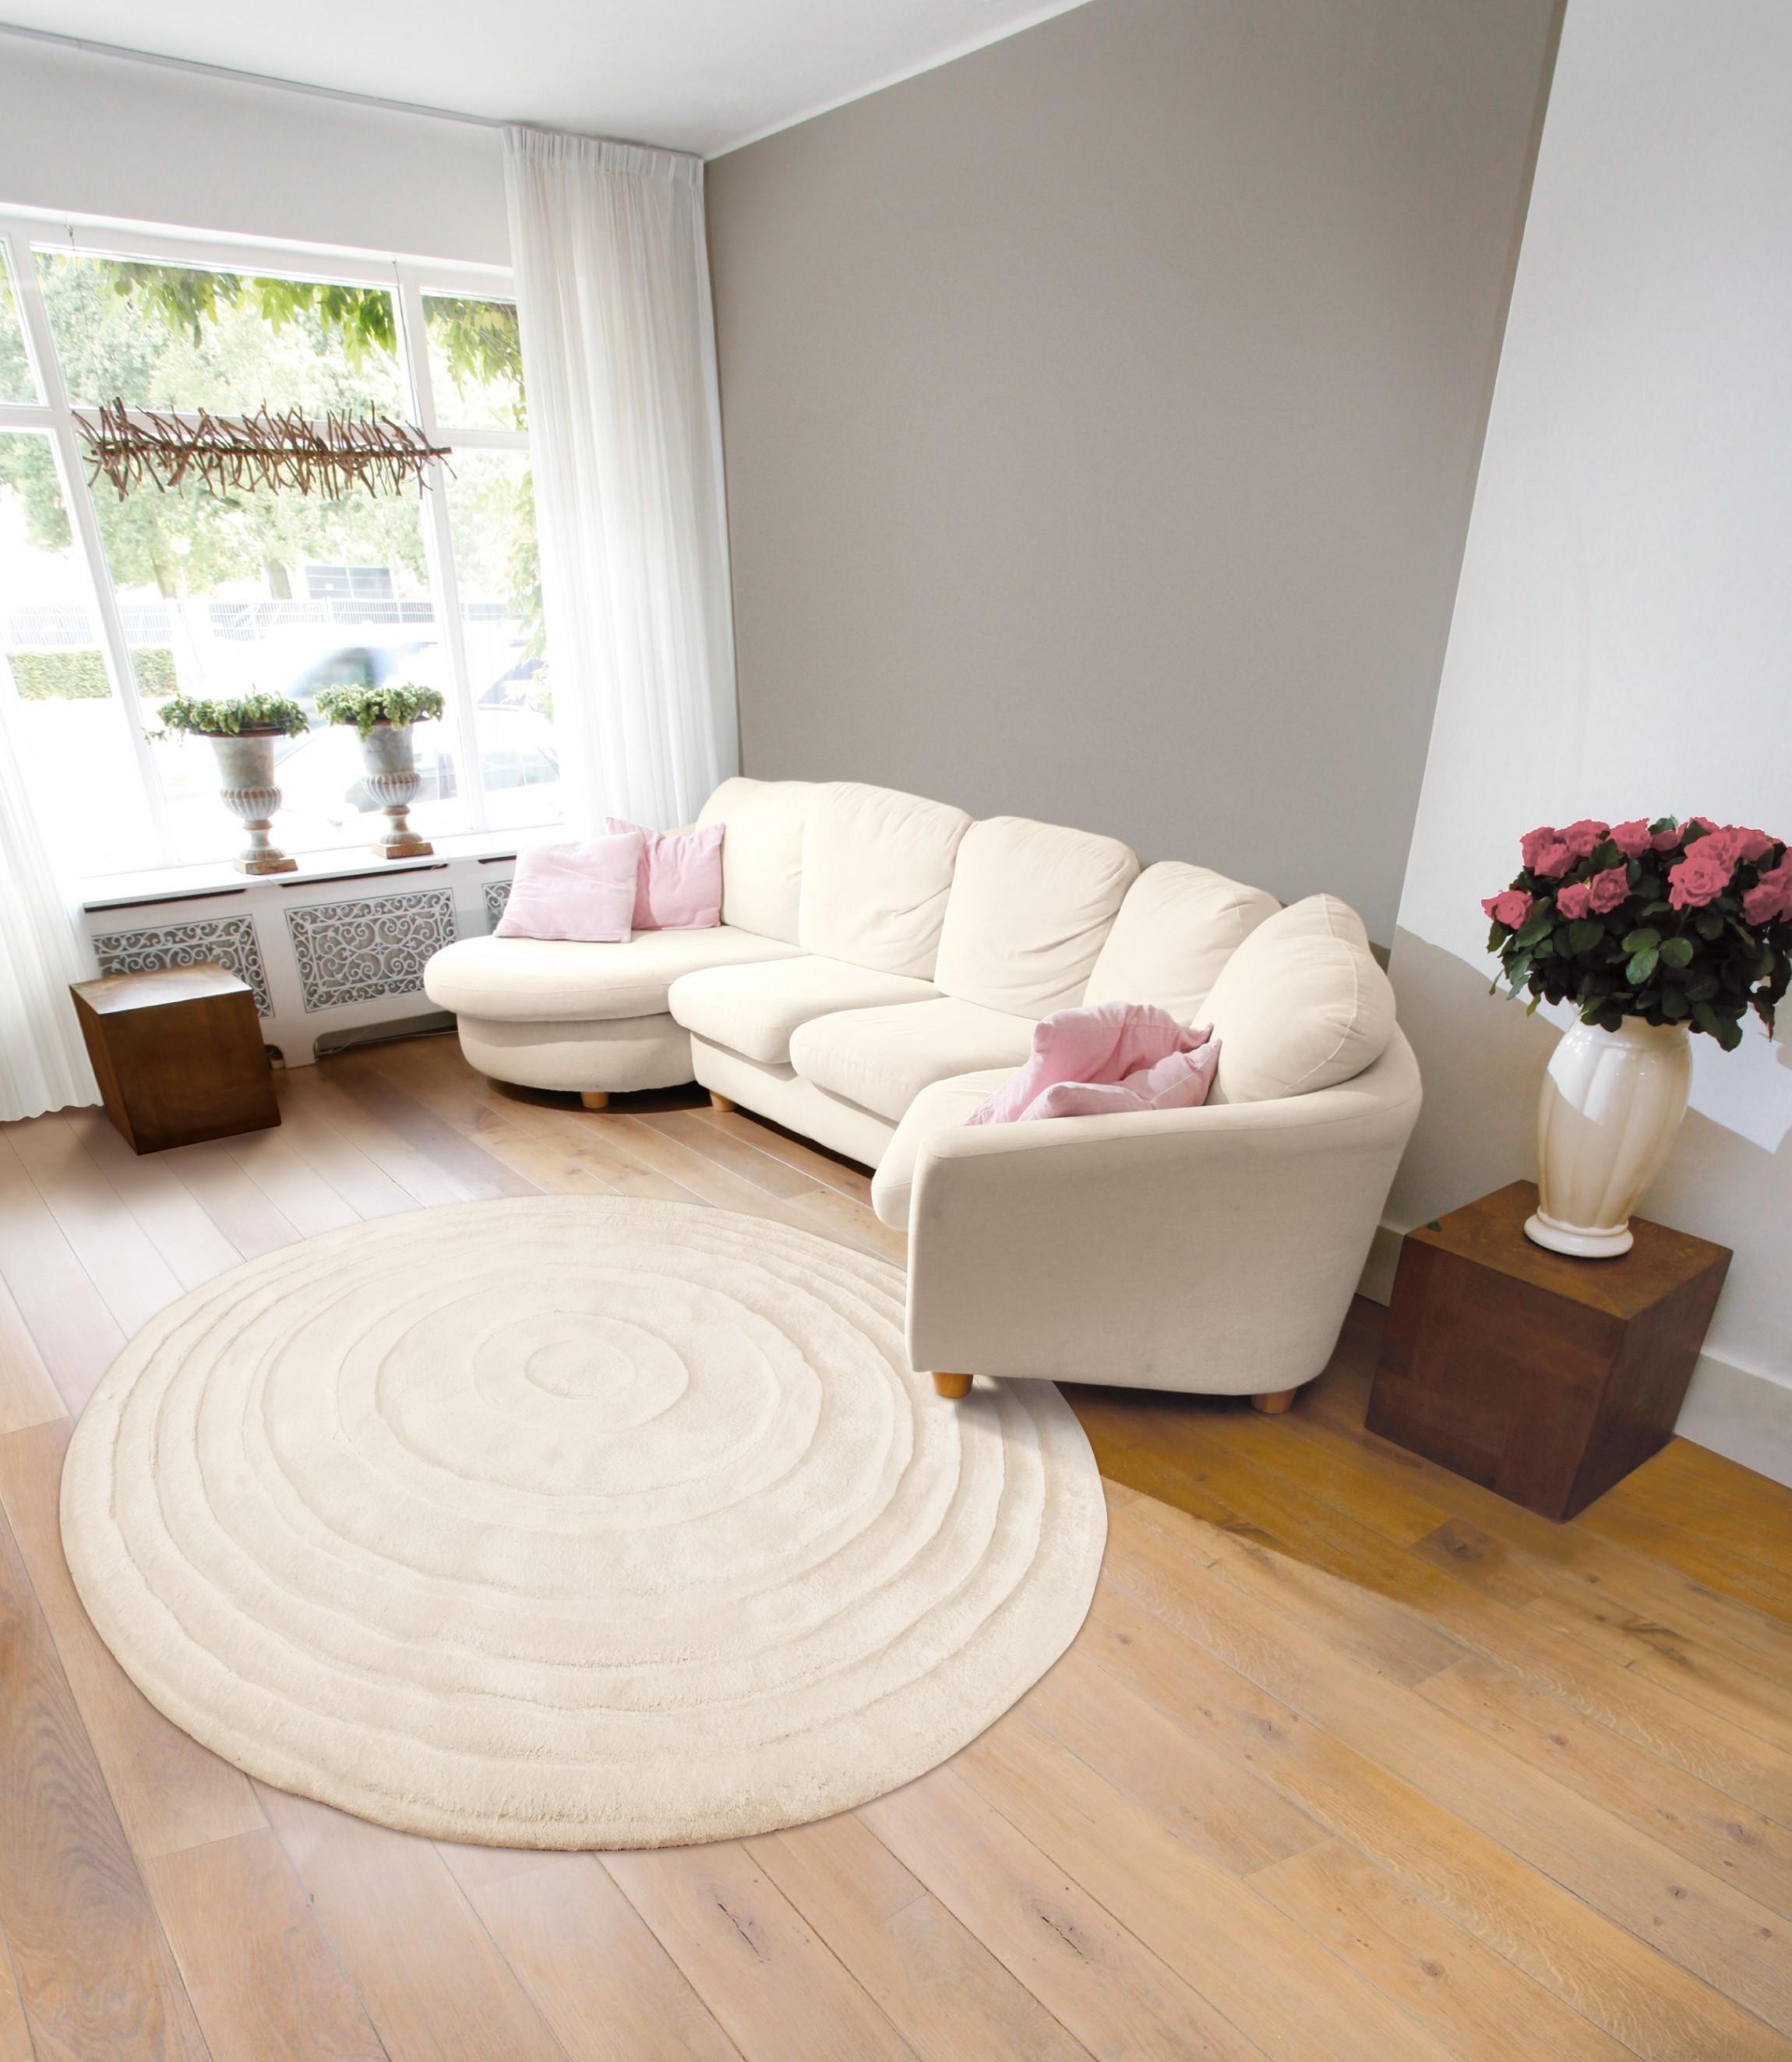 tapis rond 150 cm 244 tapis id es. Black Bedroom Furniture Sets. Home Design Ideas